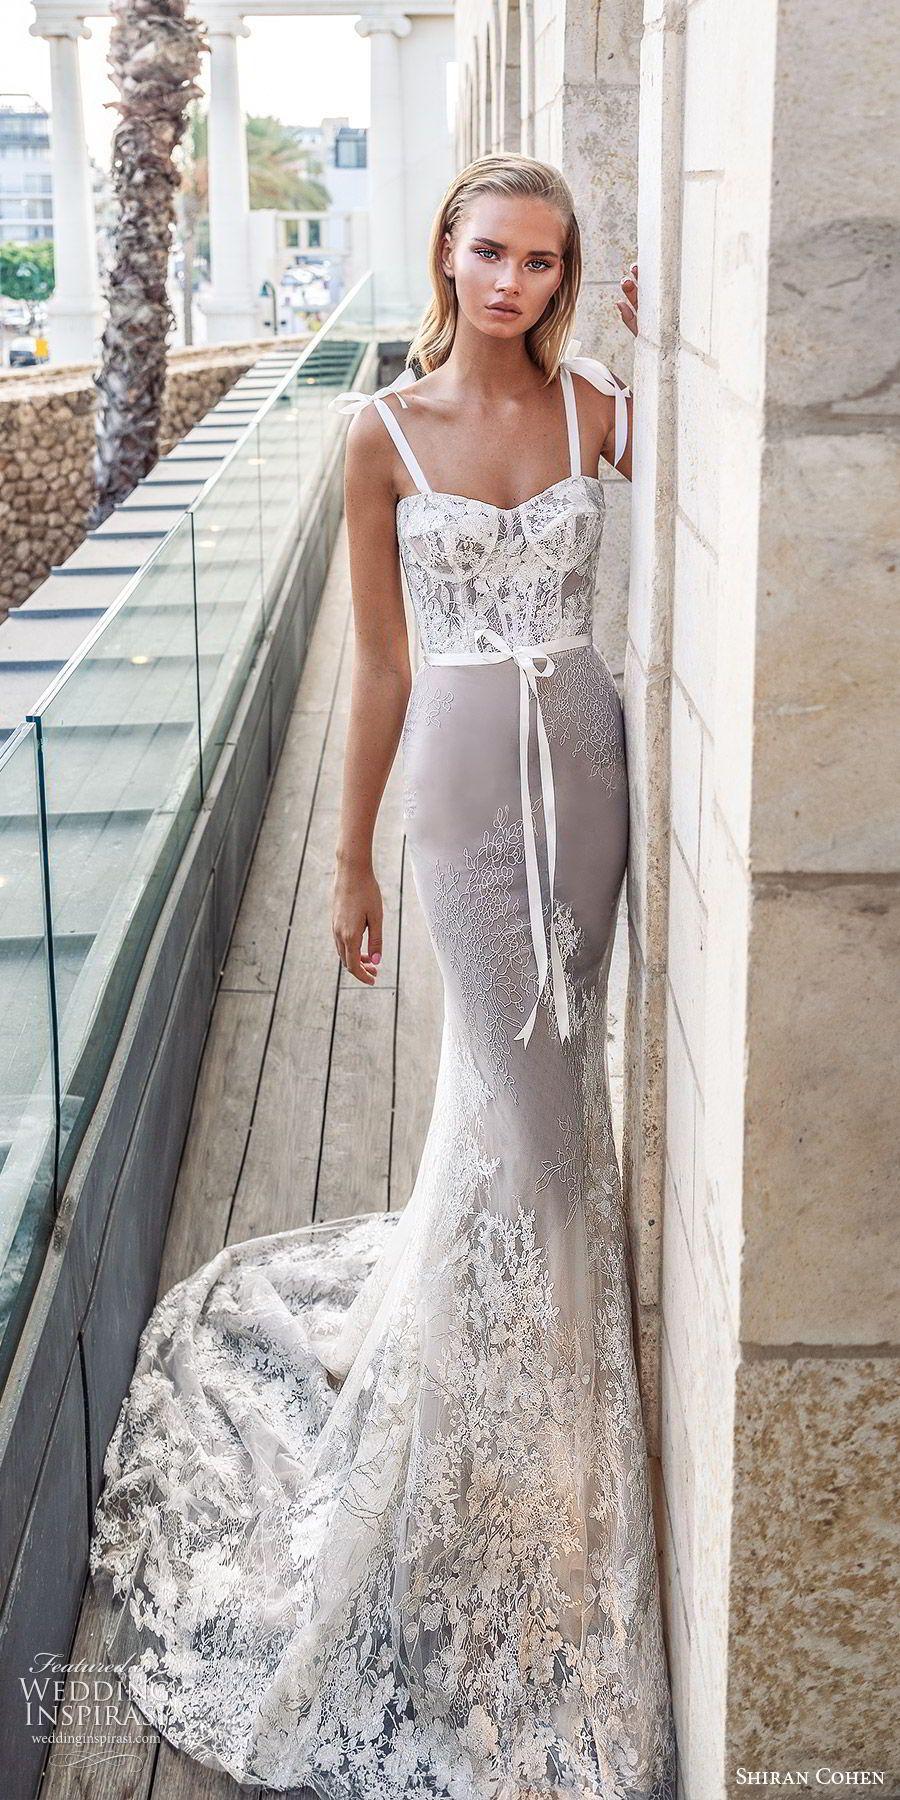 Shiran Cohen 2019 Wedding Dresses The Noble White Bridal